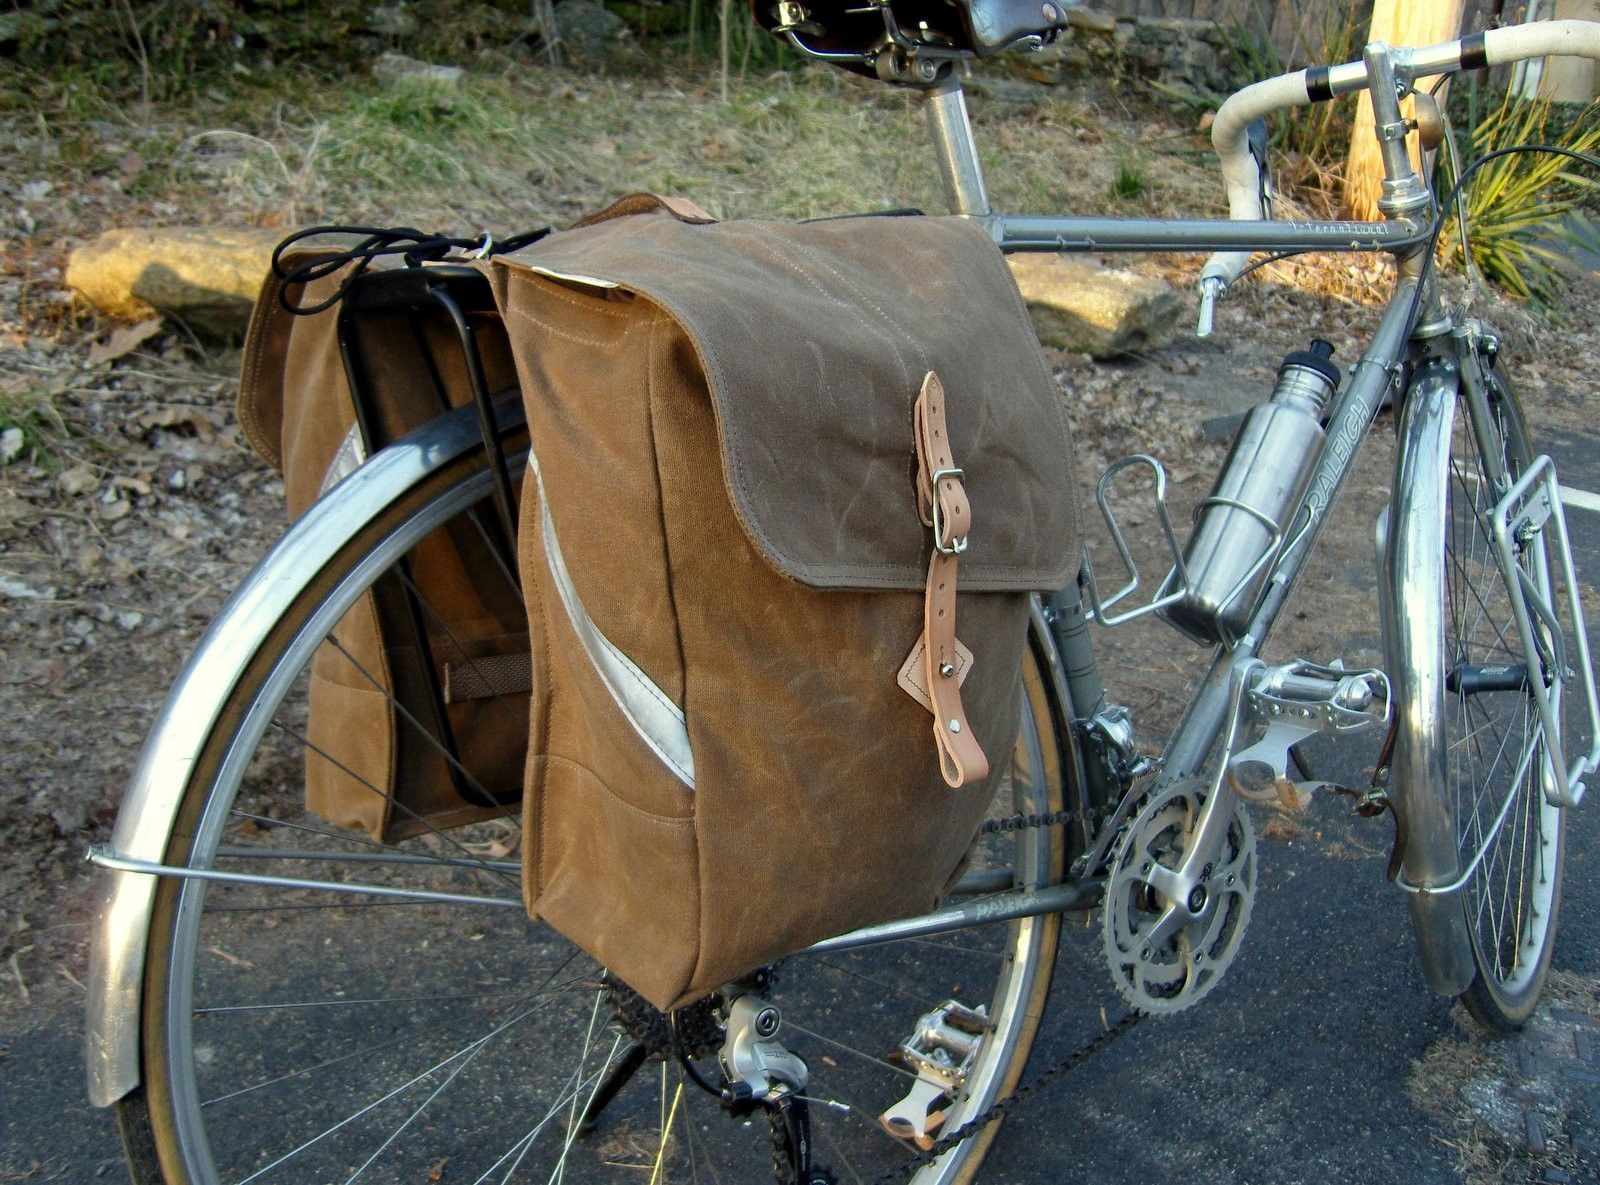 Minimalist Bike With Saddle Bags For Transport Bike Saddle Bags